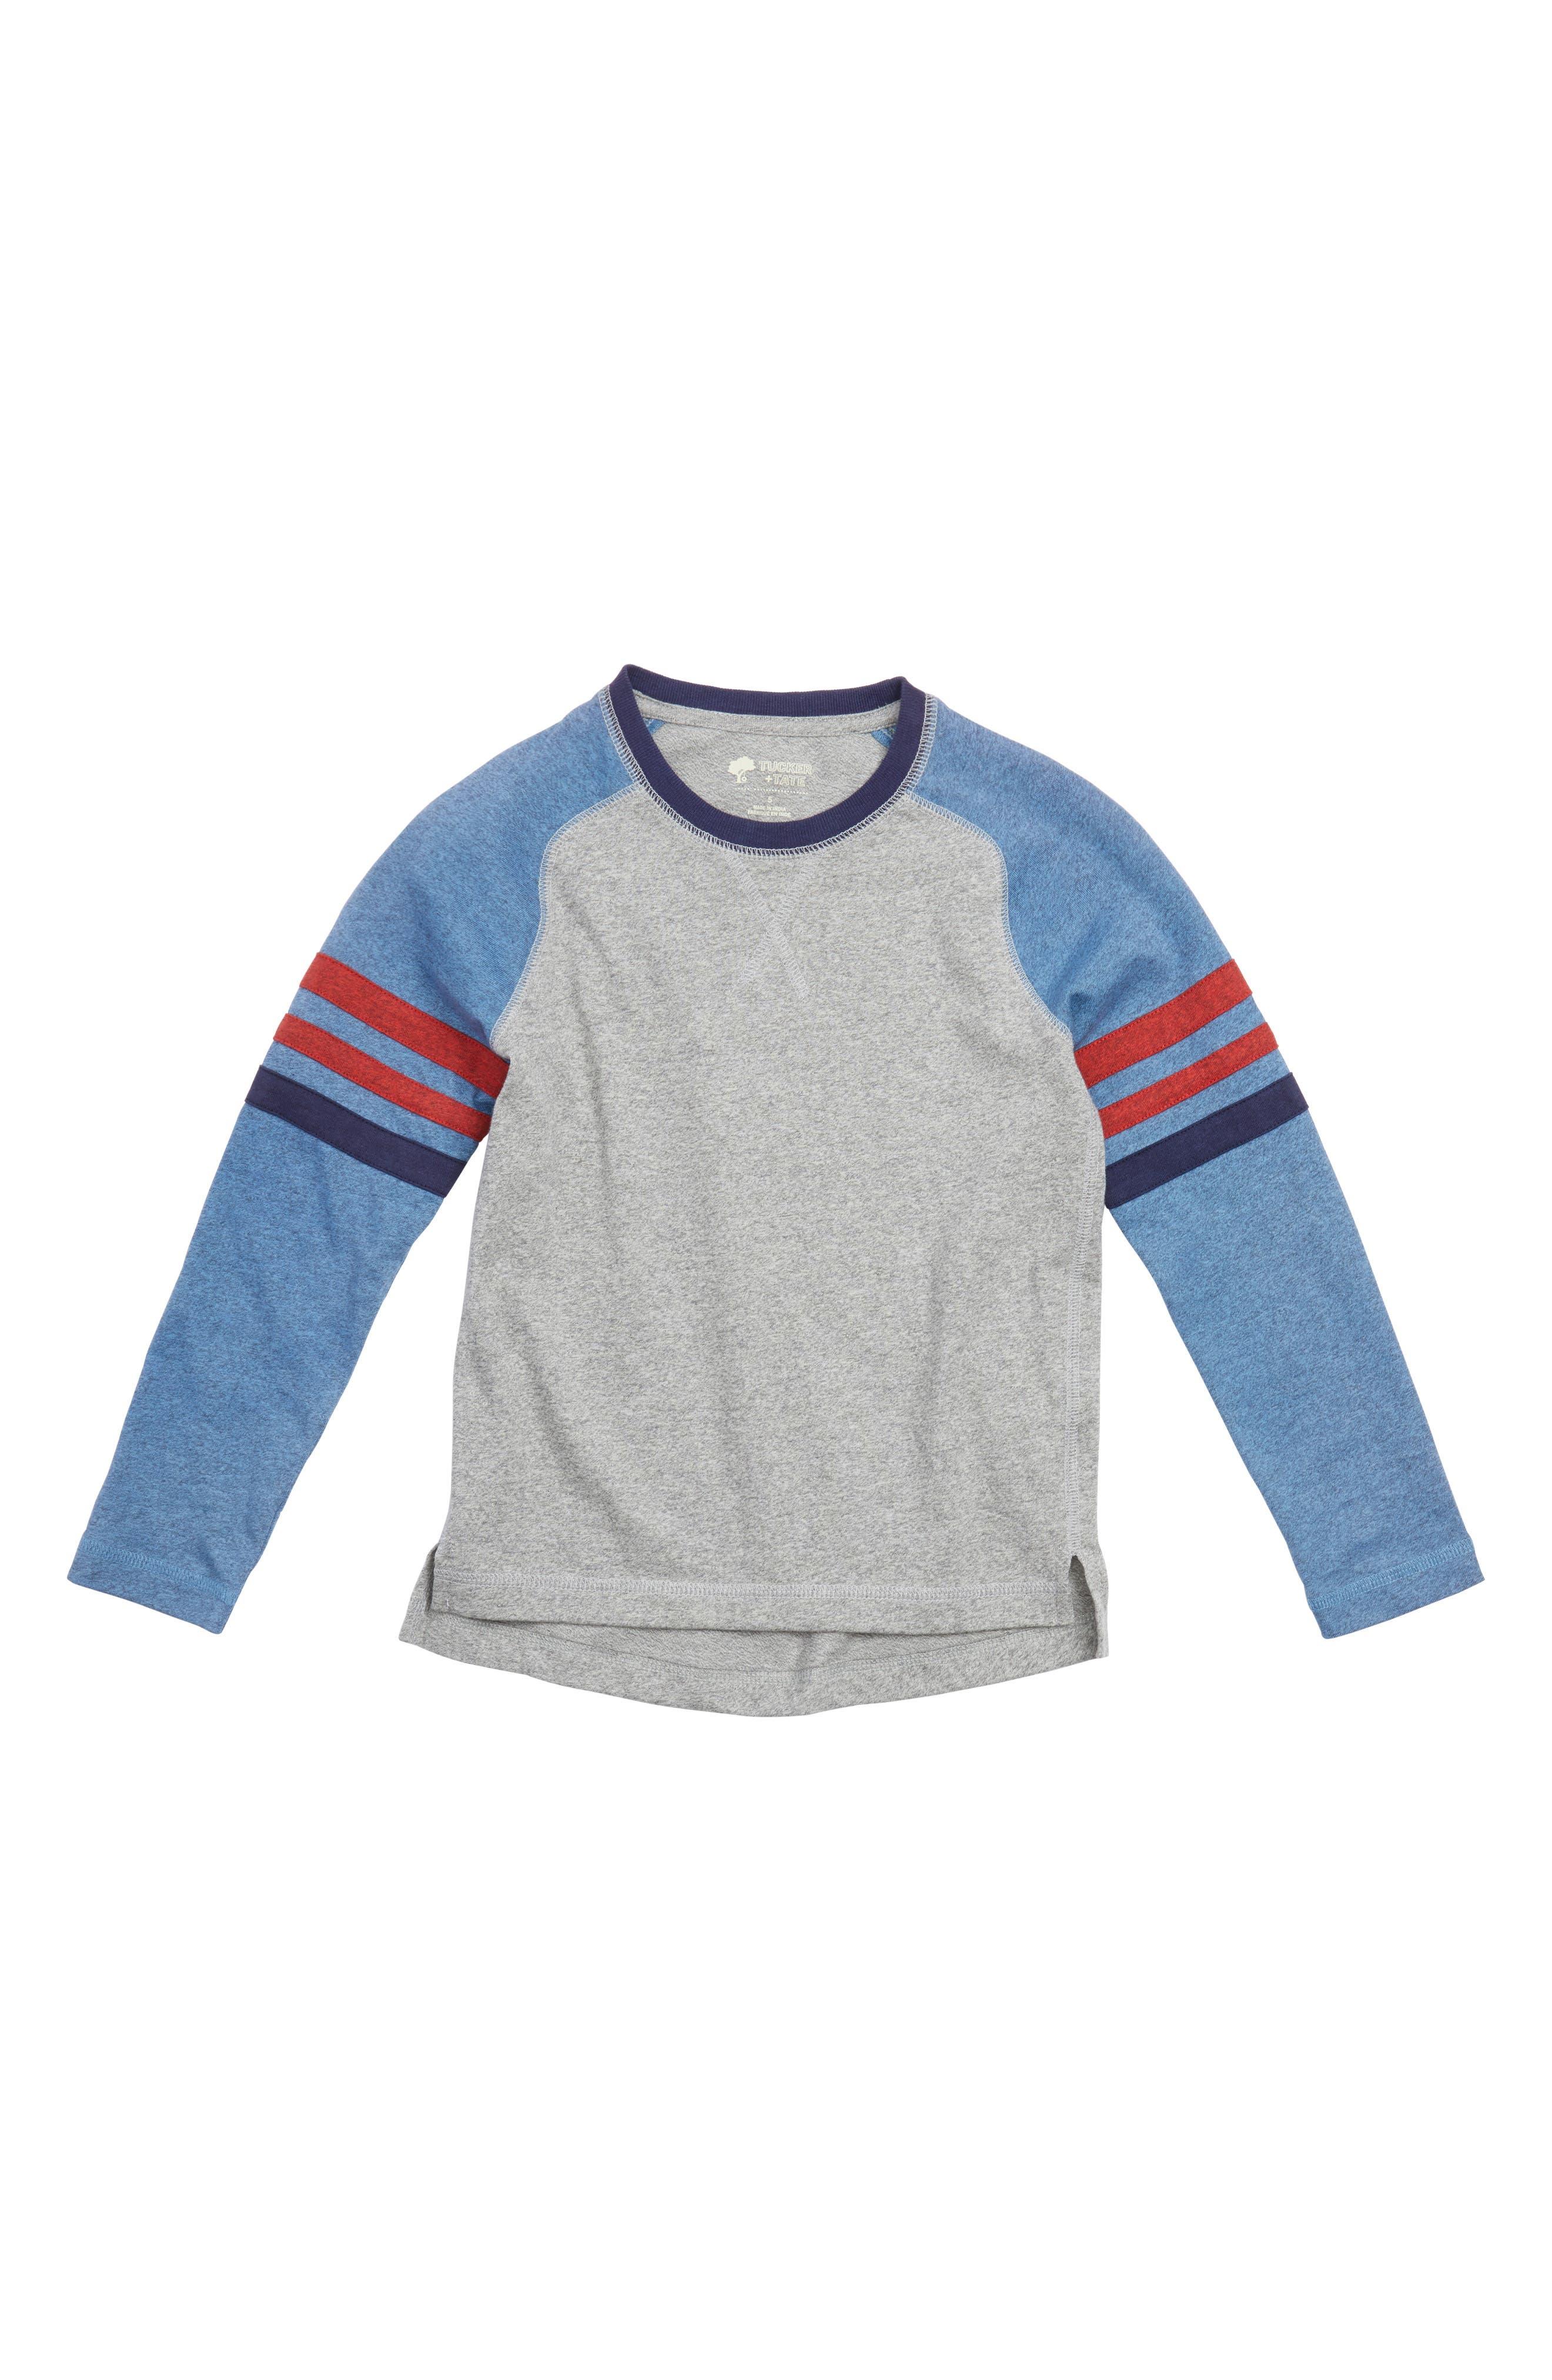 TUCKER + TATE Varsity Raglan T-Shirt